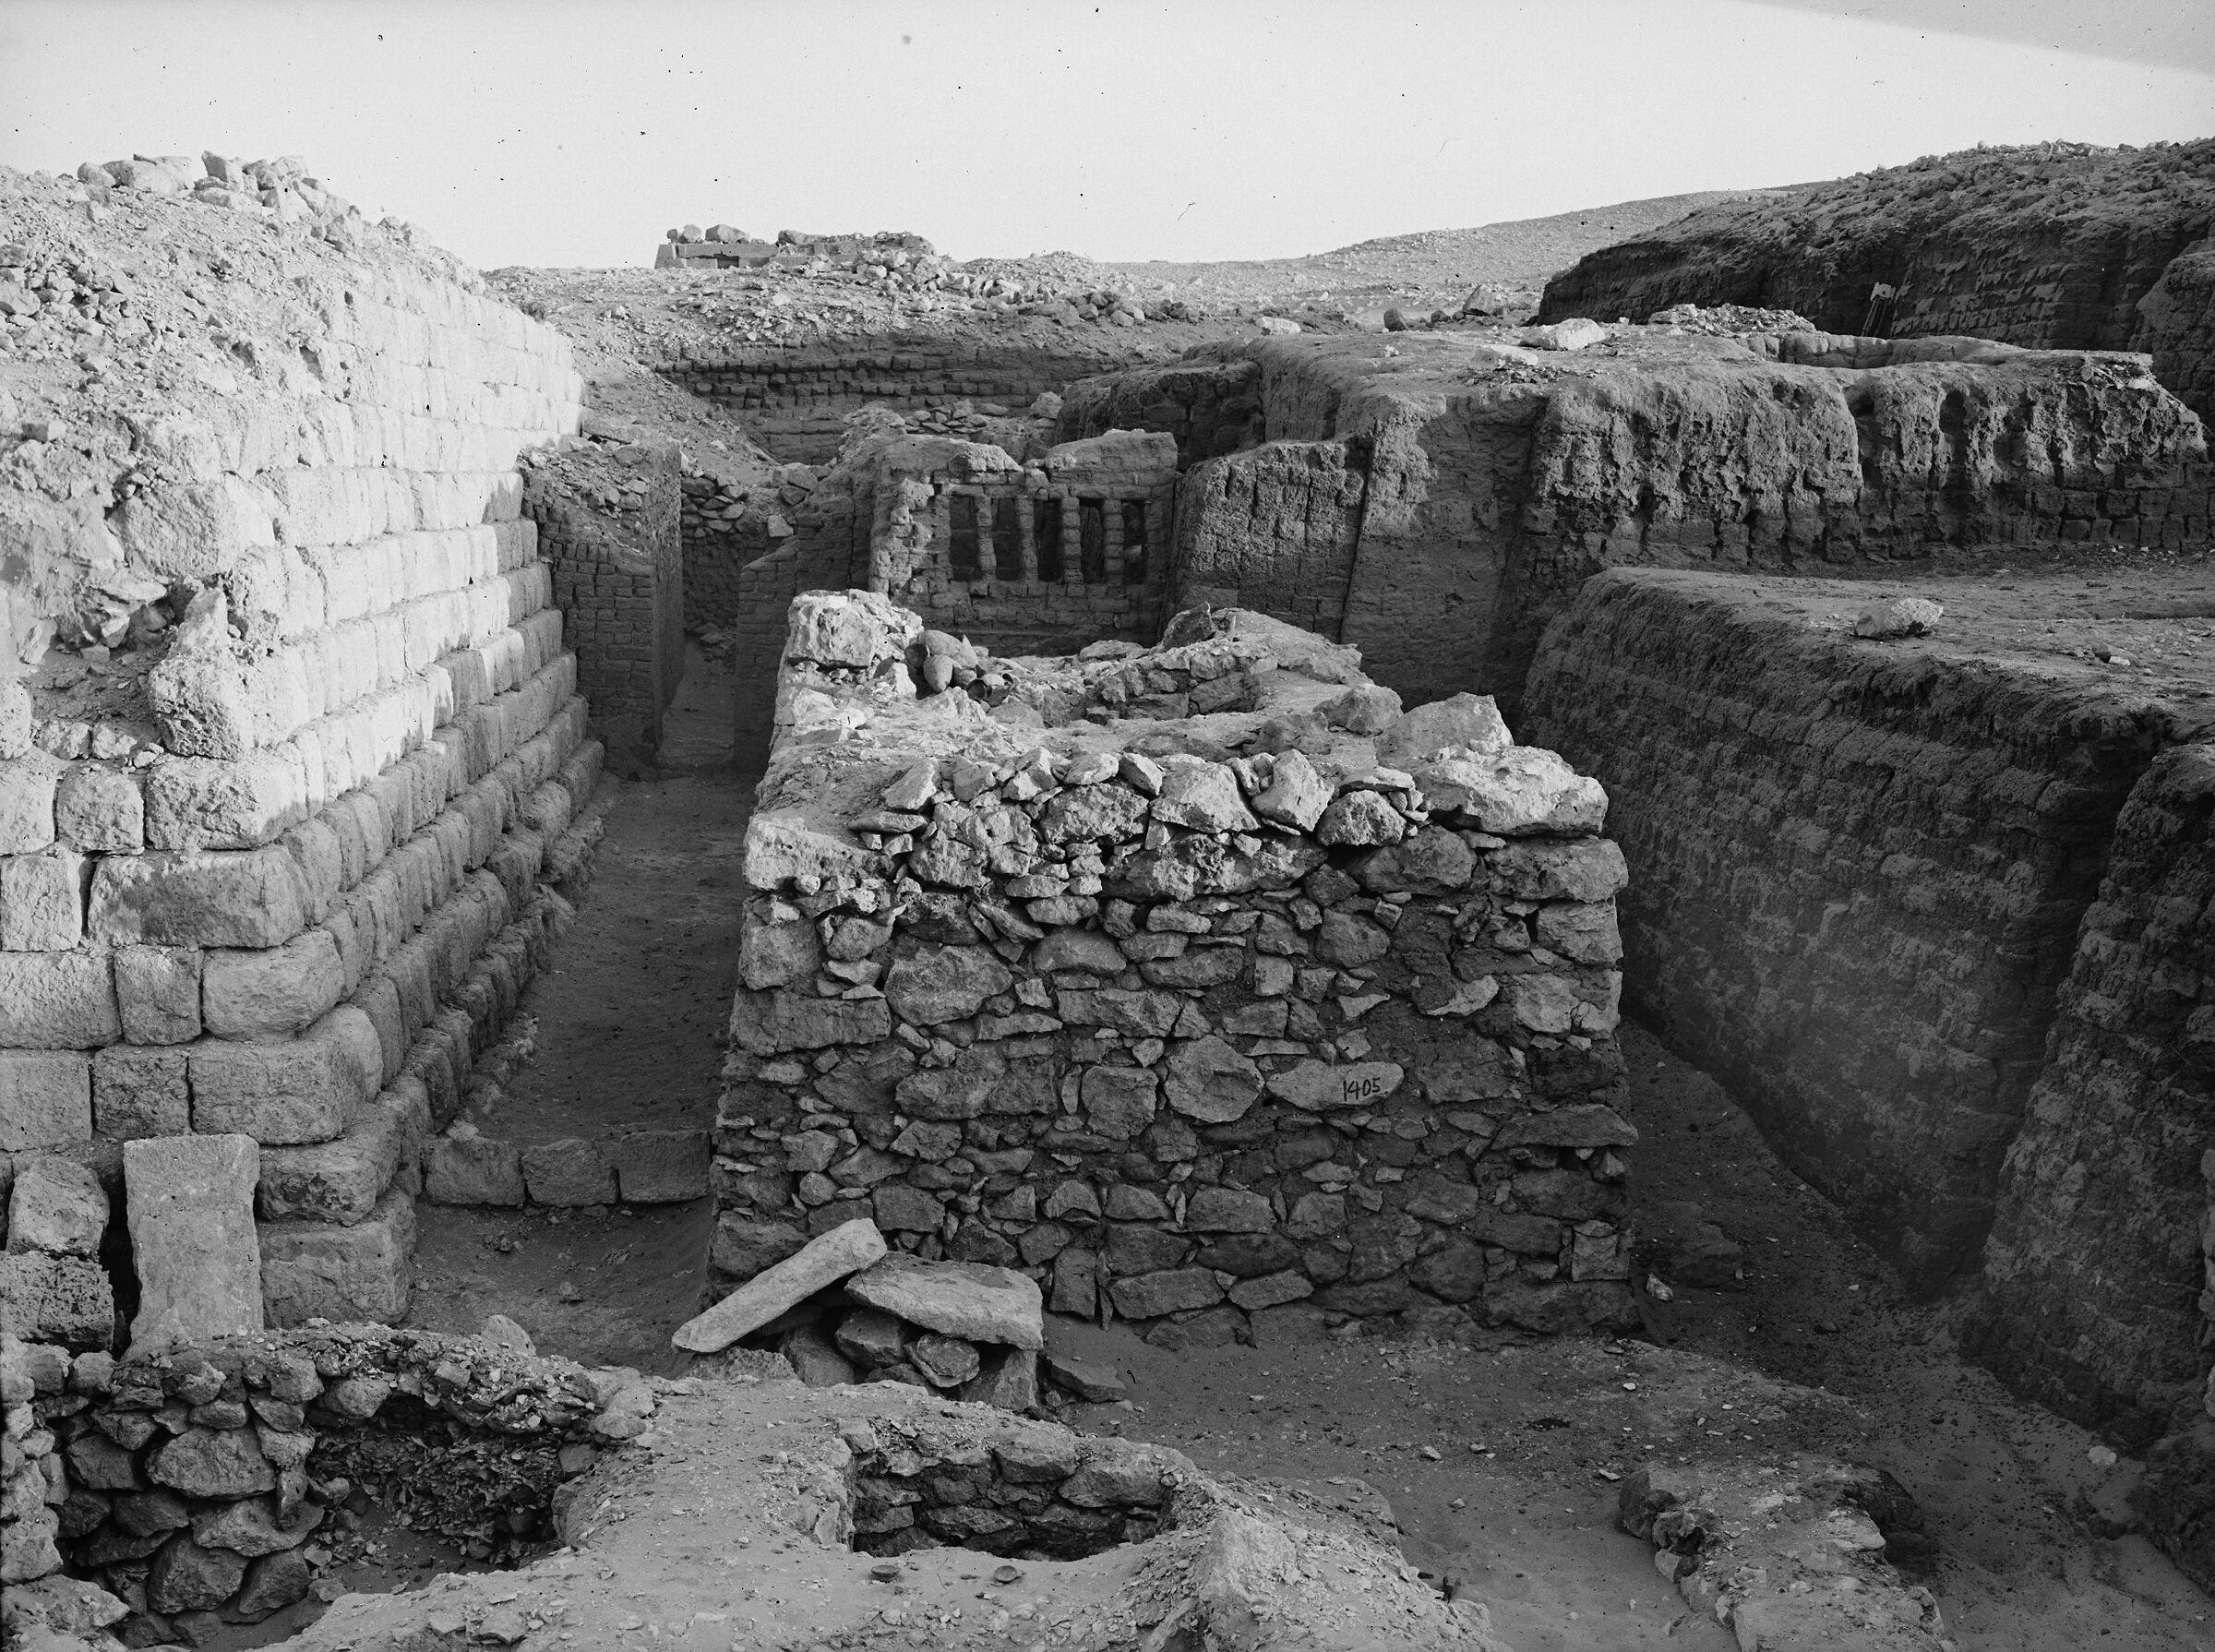 Western Cemetery: Site: Giza; View: G 1405, G 1404, G 1406, G 1209, G 1401